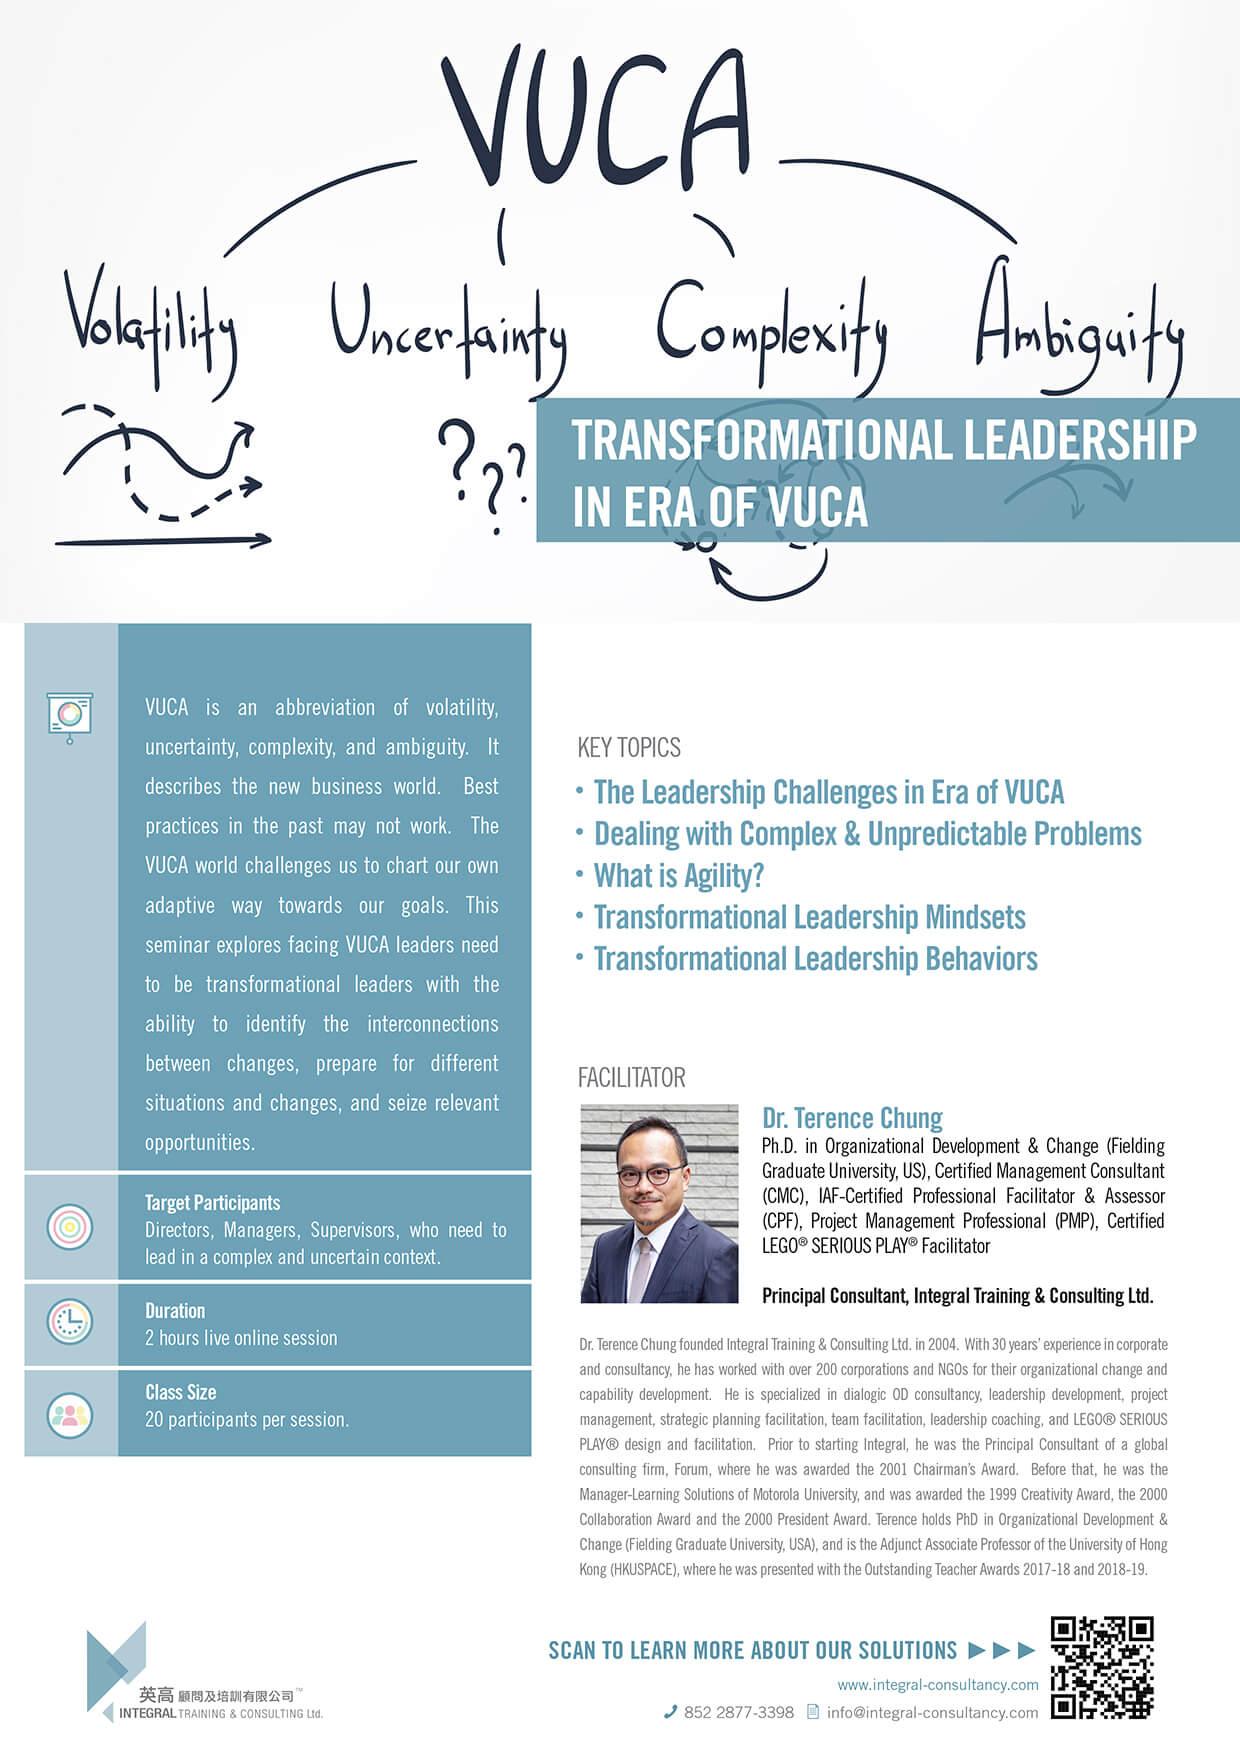 Transformational Leadership in Era of VUCA